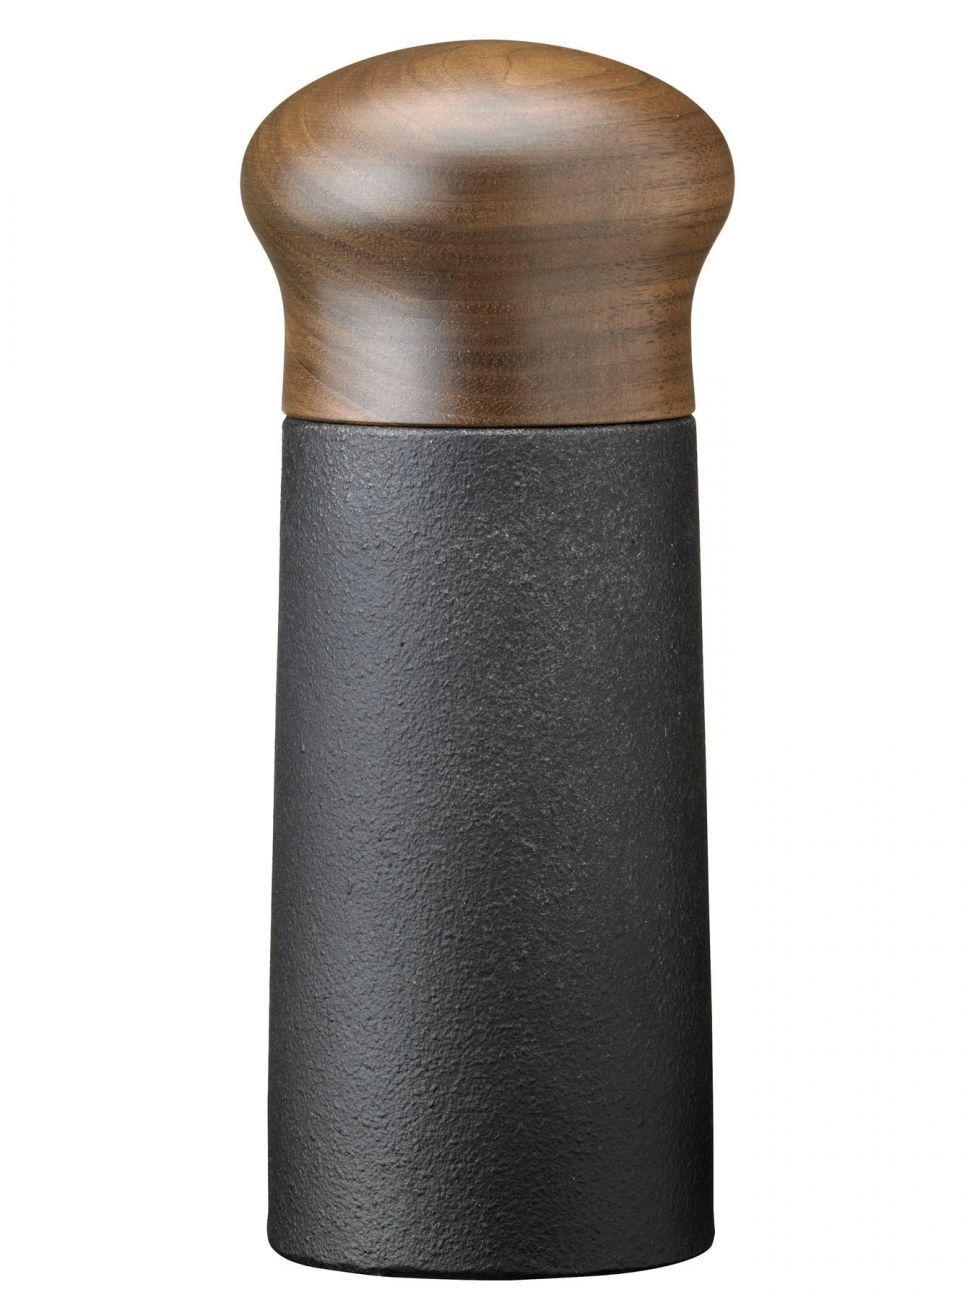 Skeppshult Herbes-Et le Poivre Moulin en fonte avec walnussholz couvercle 15 cm